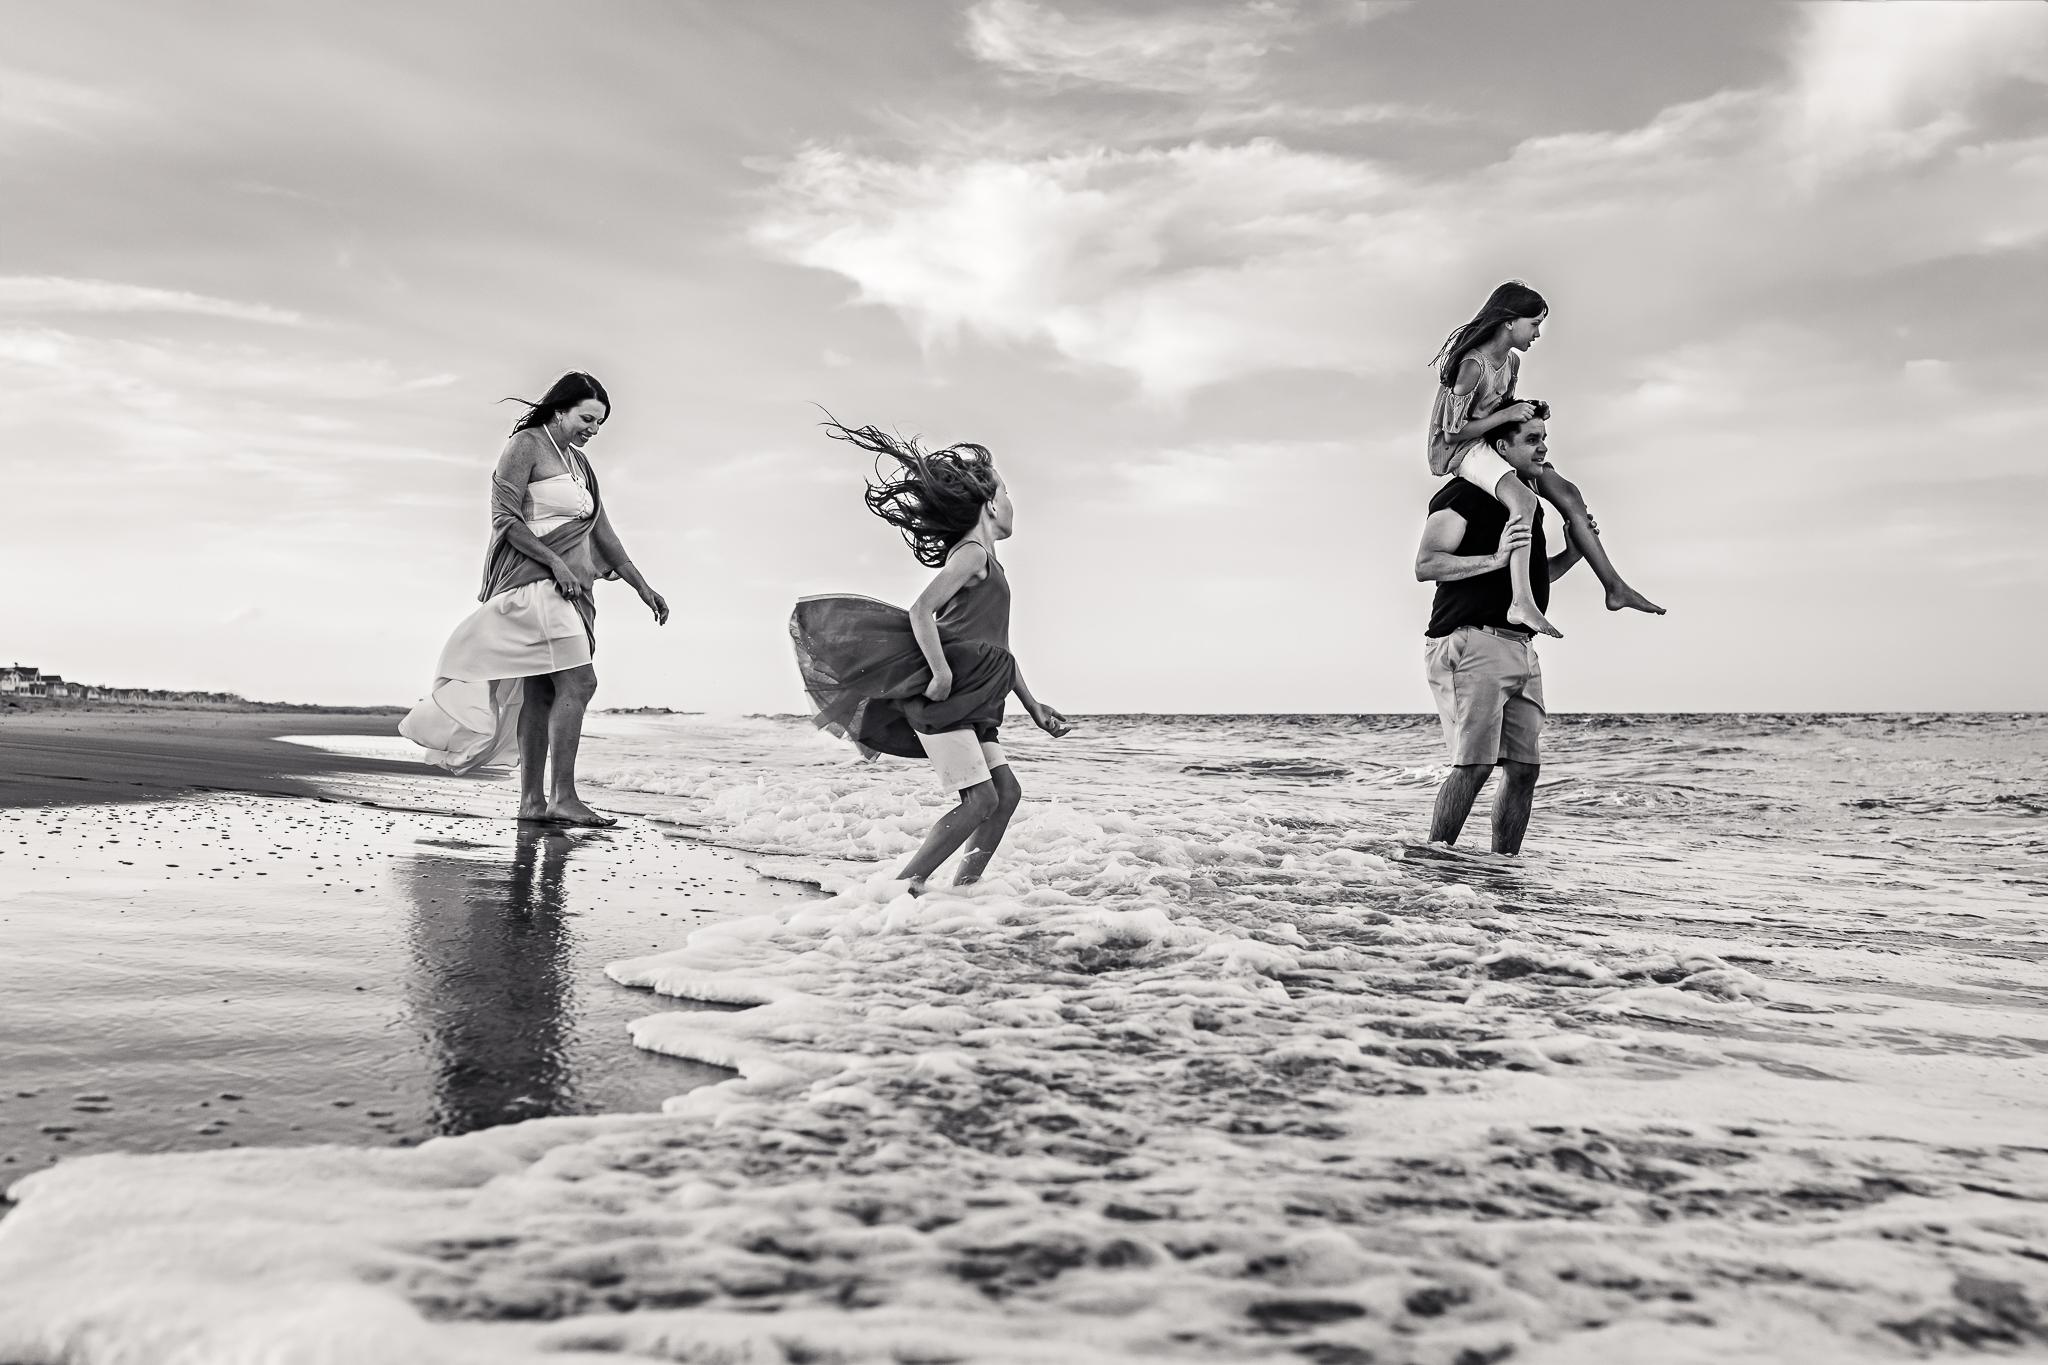 NancyElizabethPhotography, South Jersey Photographer, Family Walking in Ocean